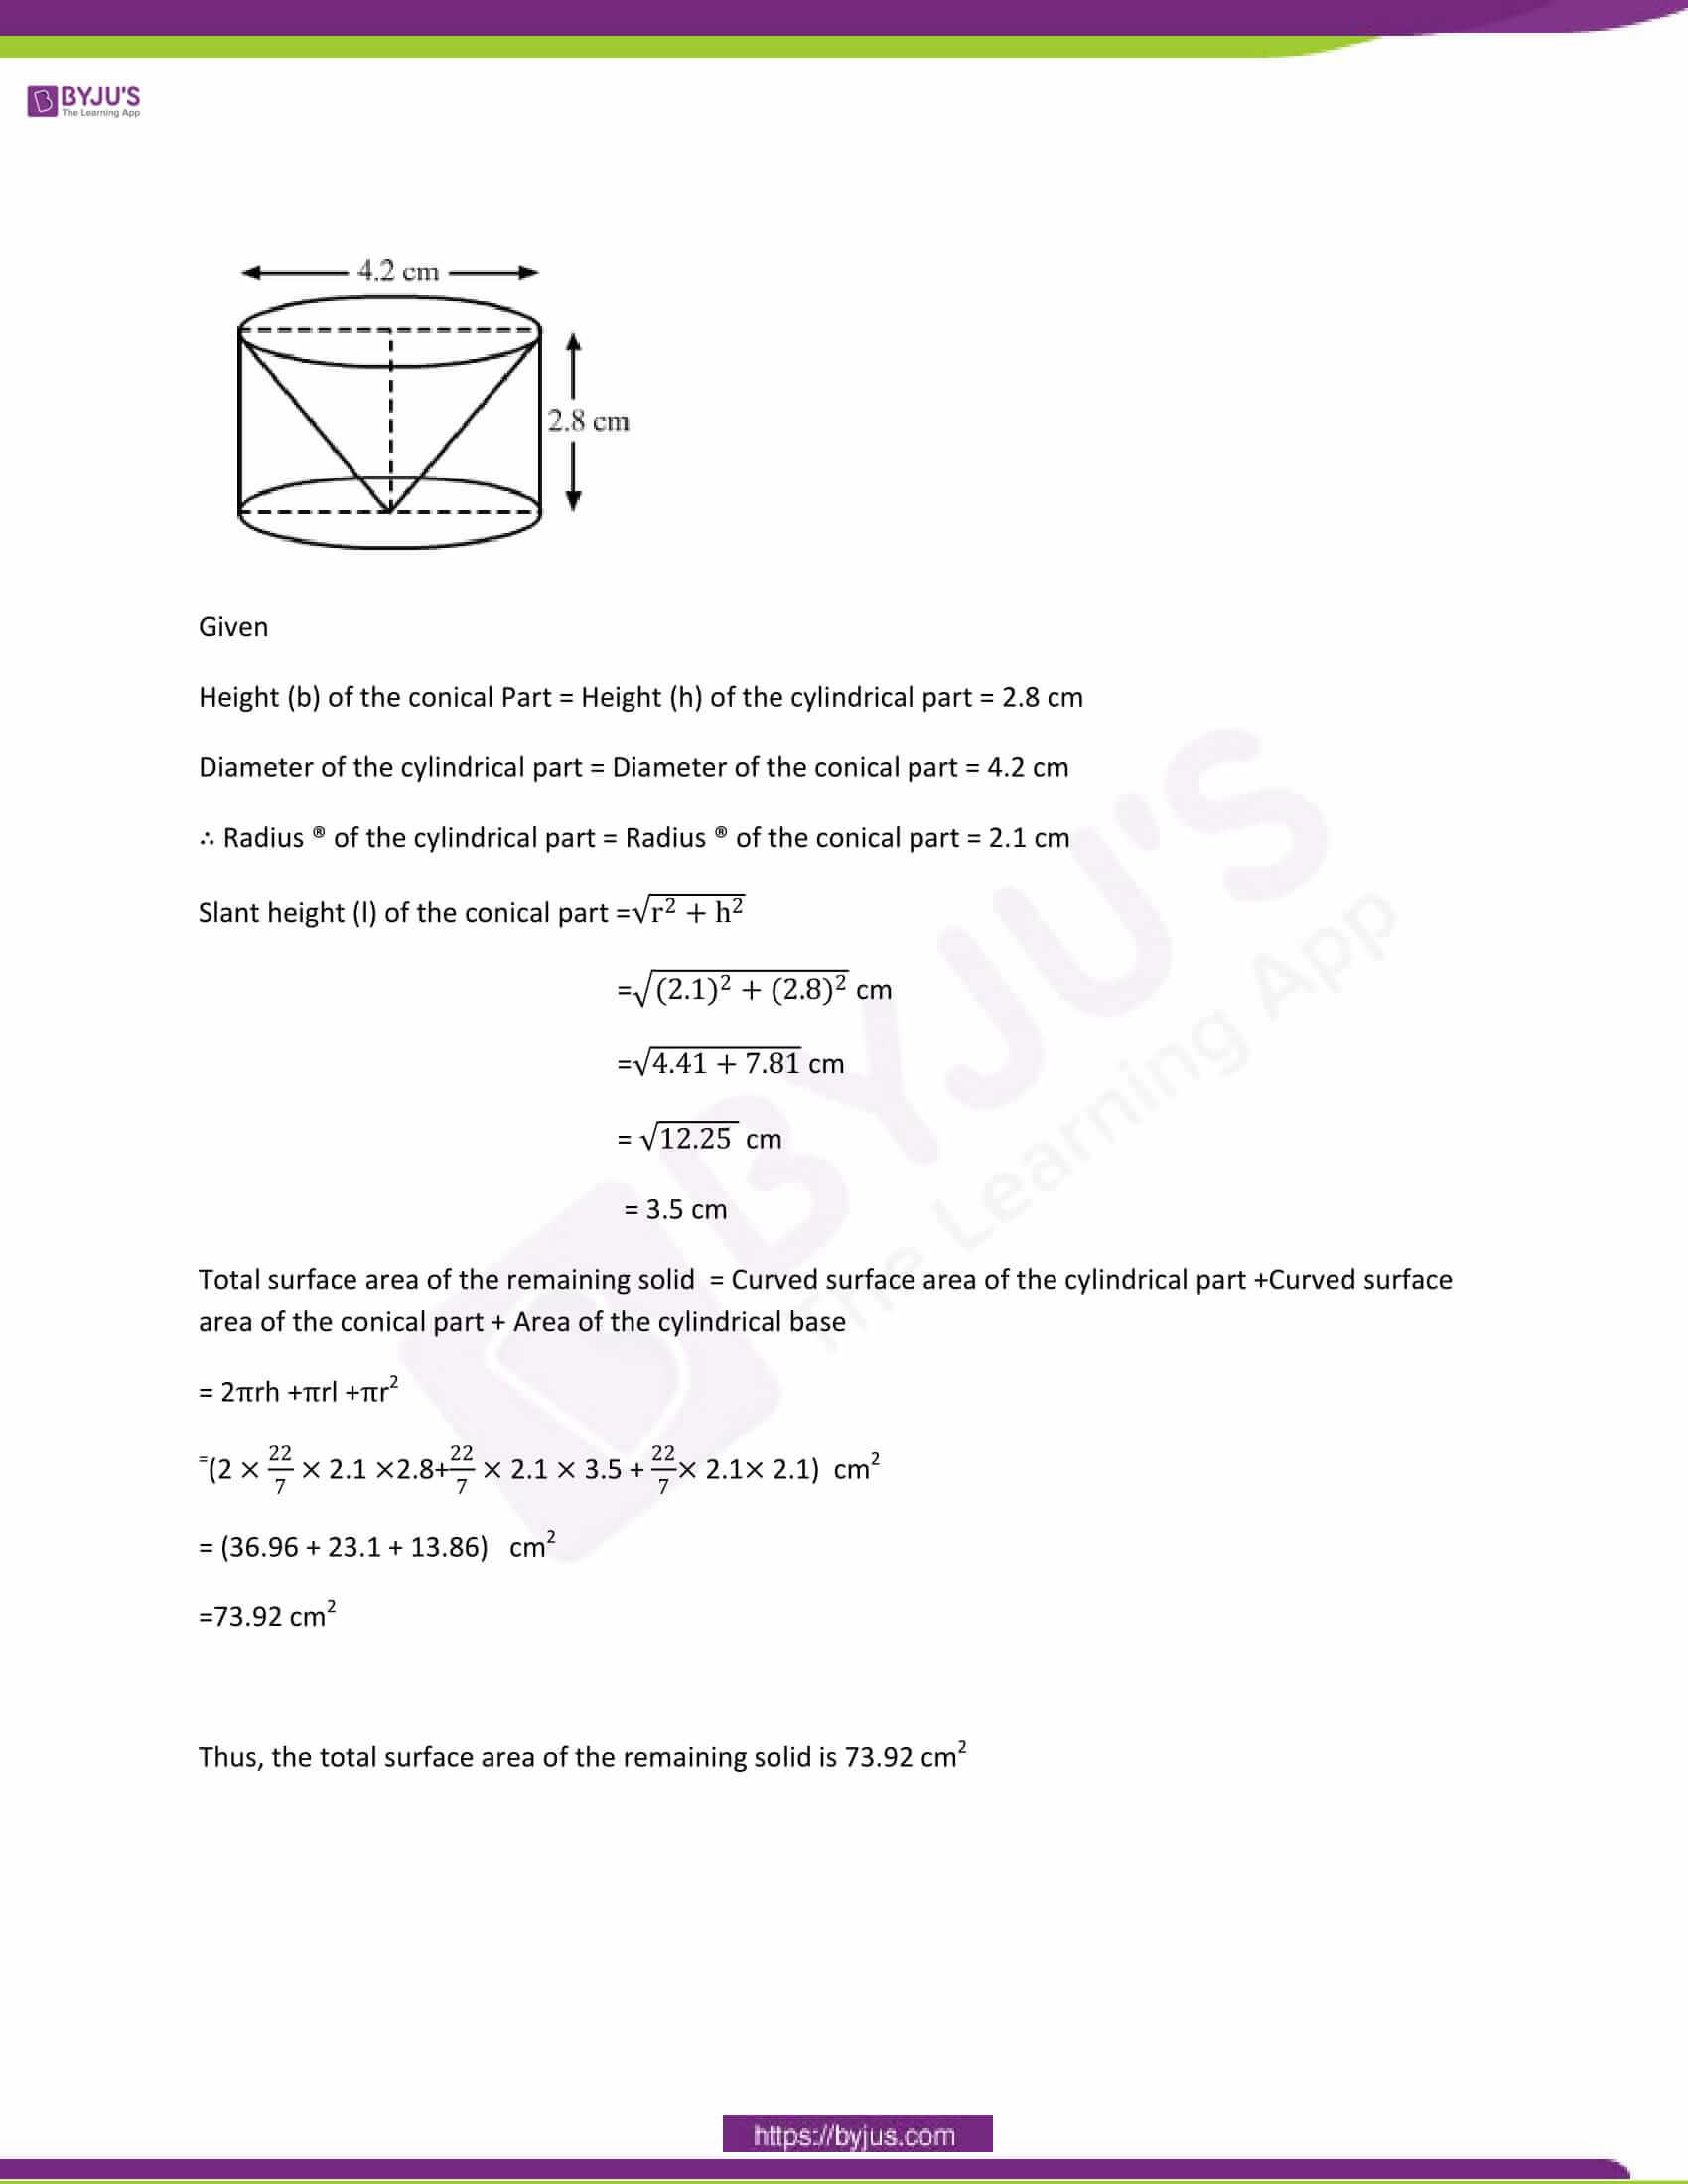 CBSE Class 10 Maths Papers Solution 2014 25